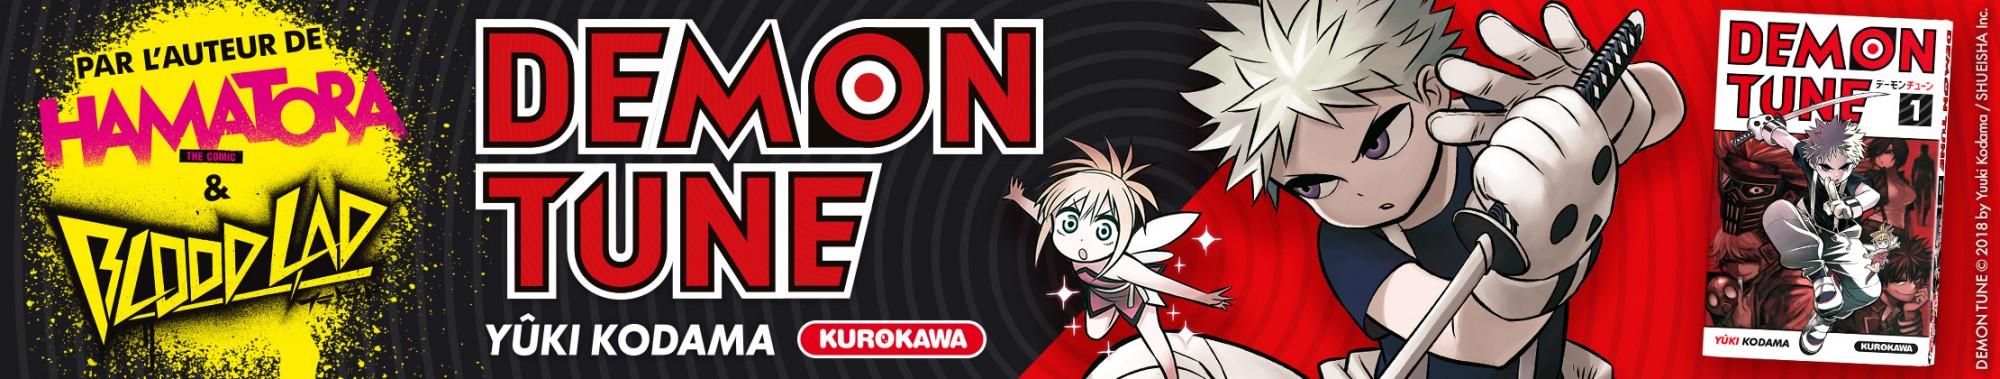 Bannière - KUROKAWA - Demon Tune - Tome 01